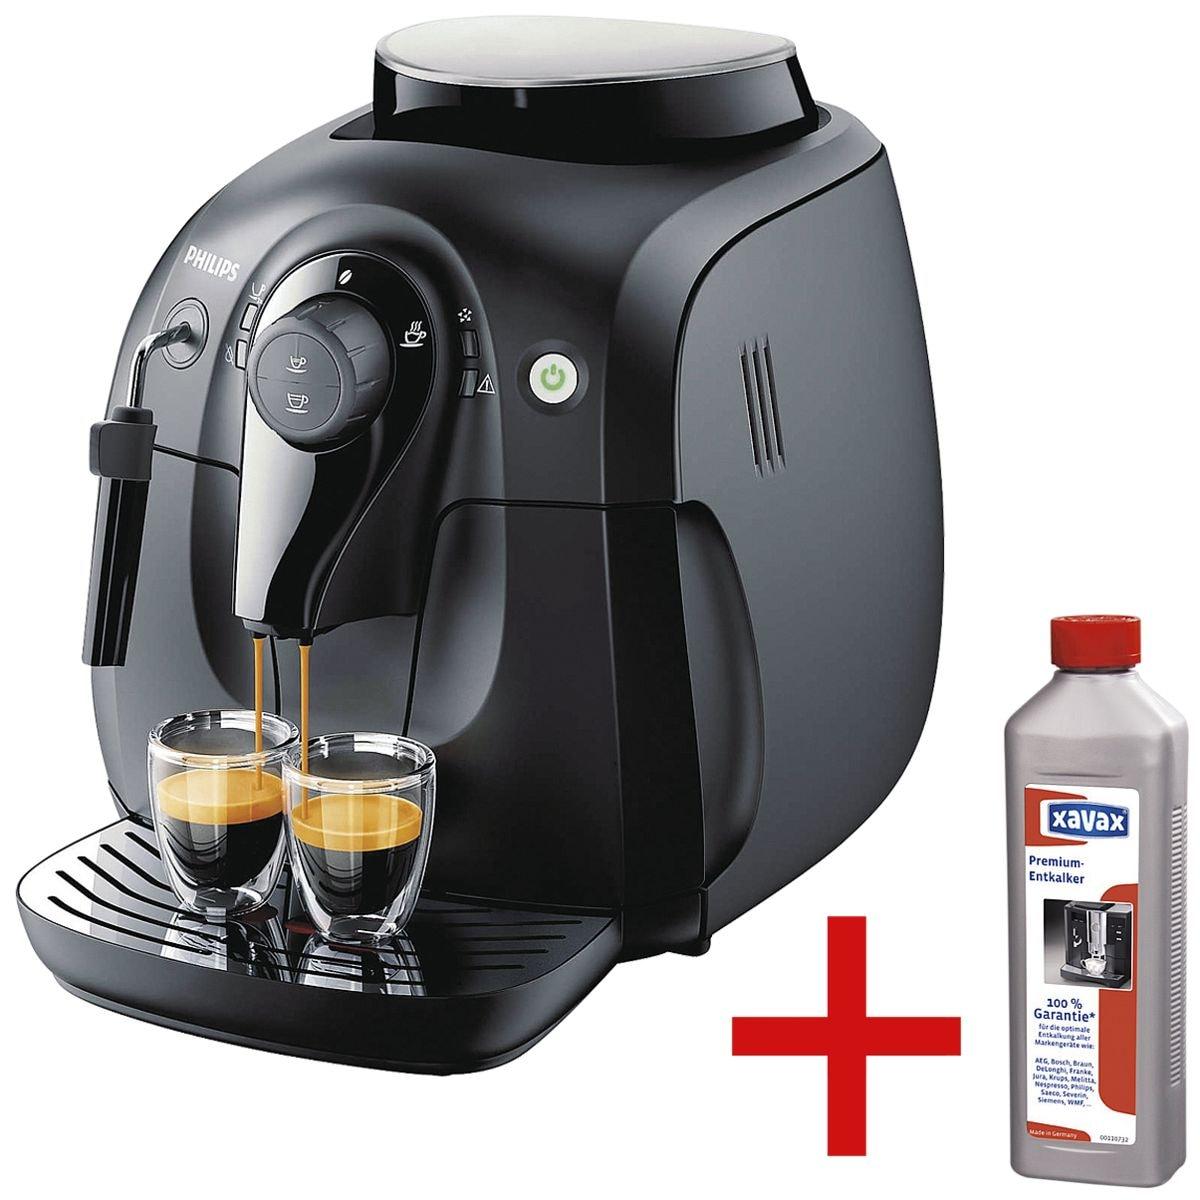 philips kaffeevollautomat hd 8651 inkl entkalker bei. Black Bedroom Furniture Sets. Home Design Ideas